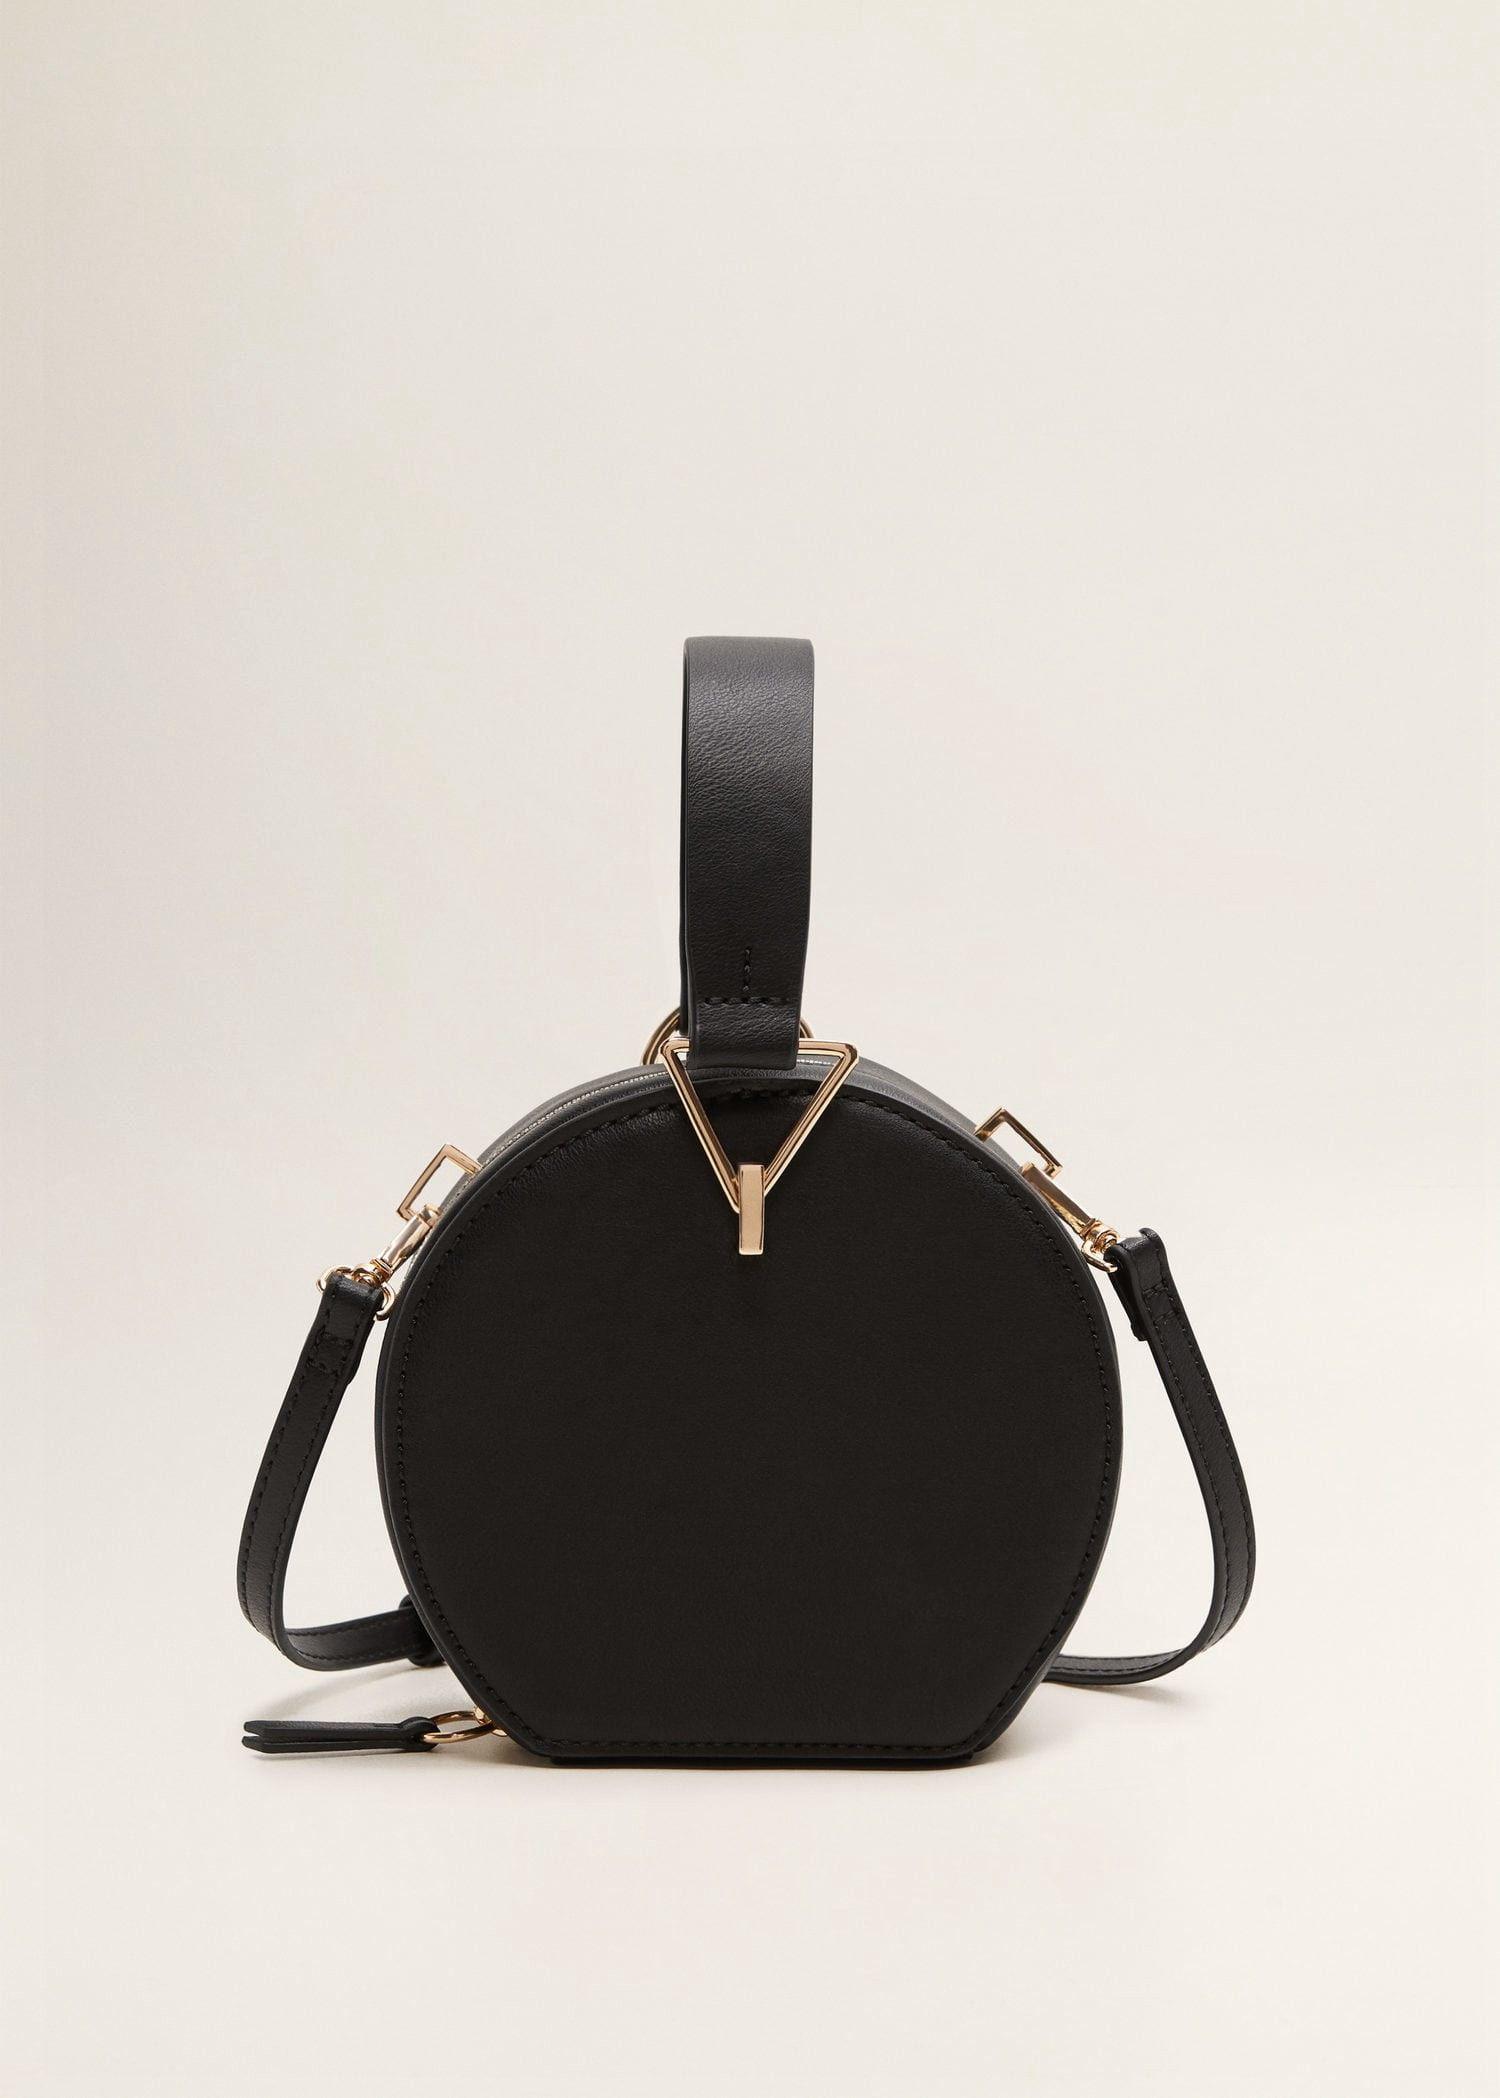 29400183e0 Mango Round Small Bag - Black One Size